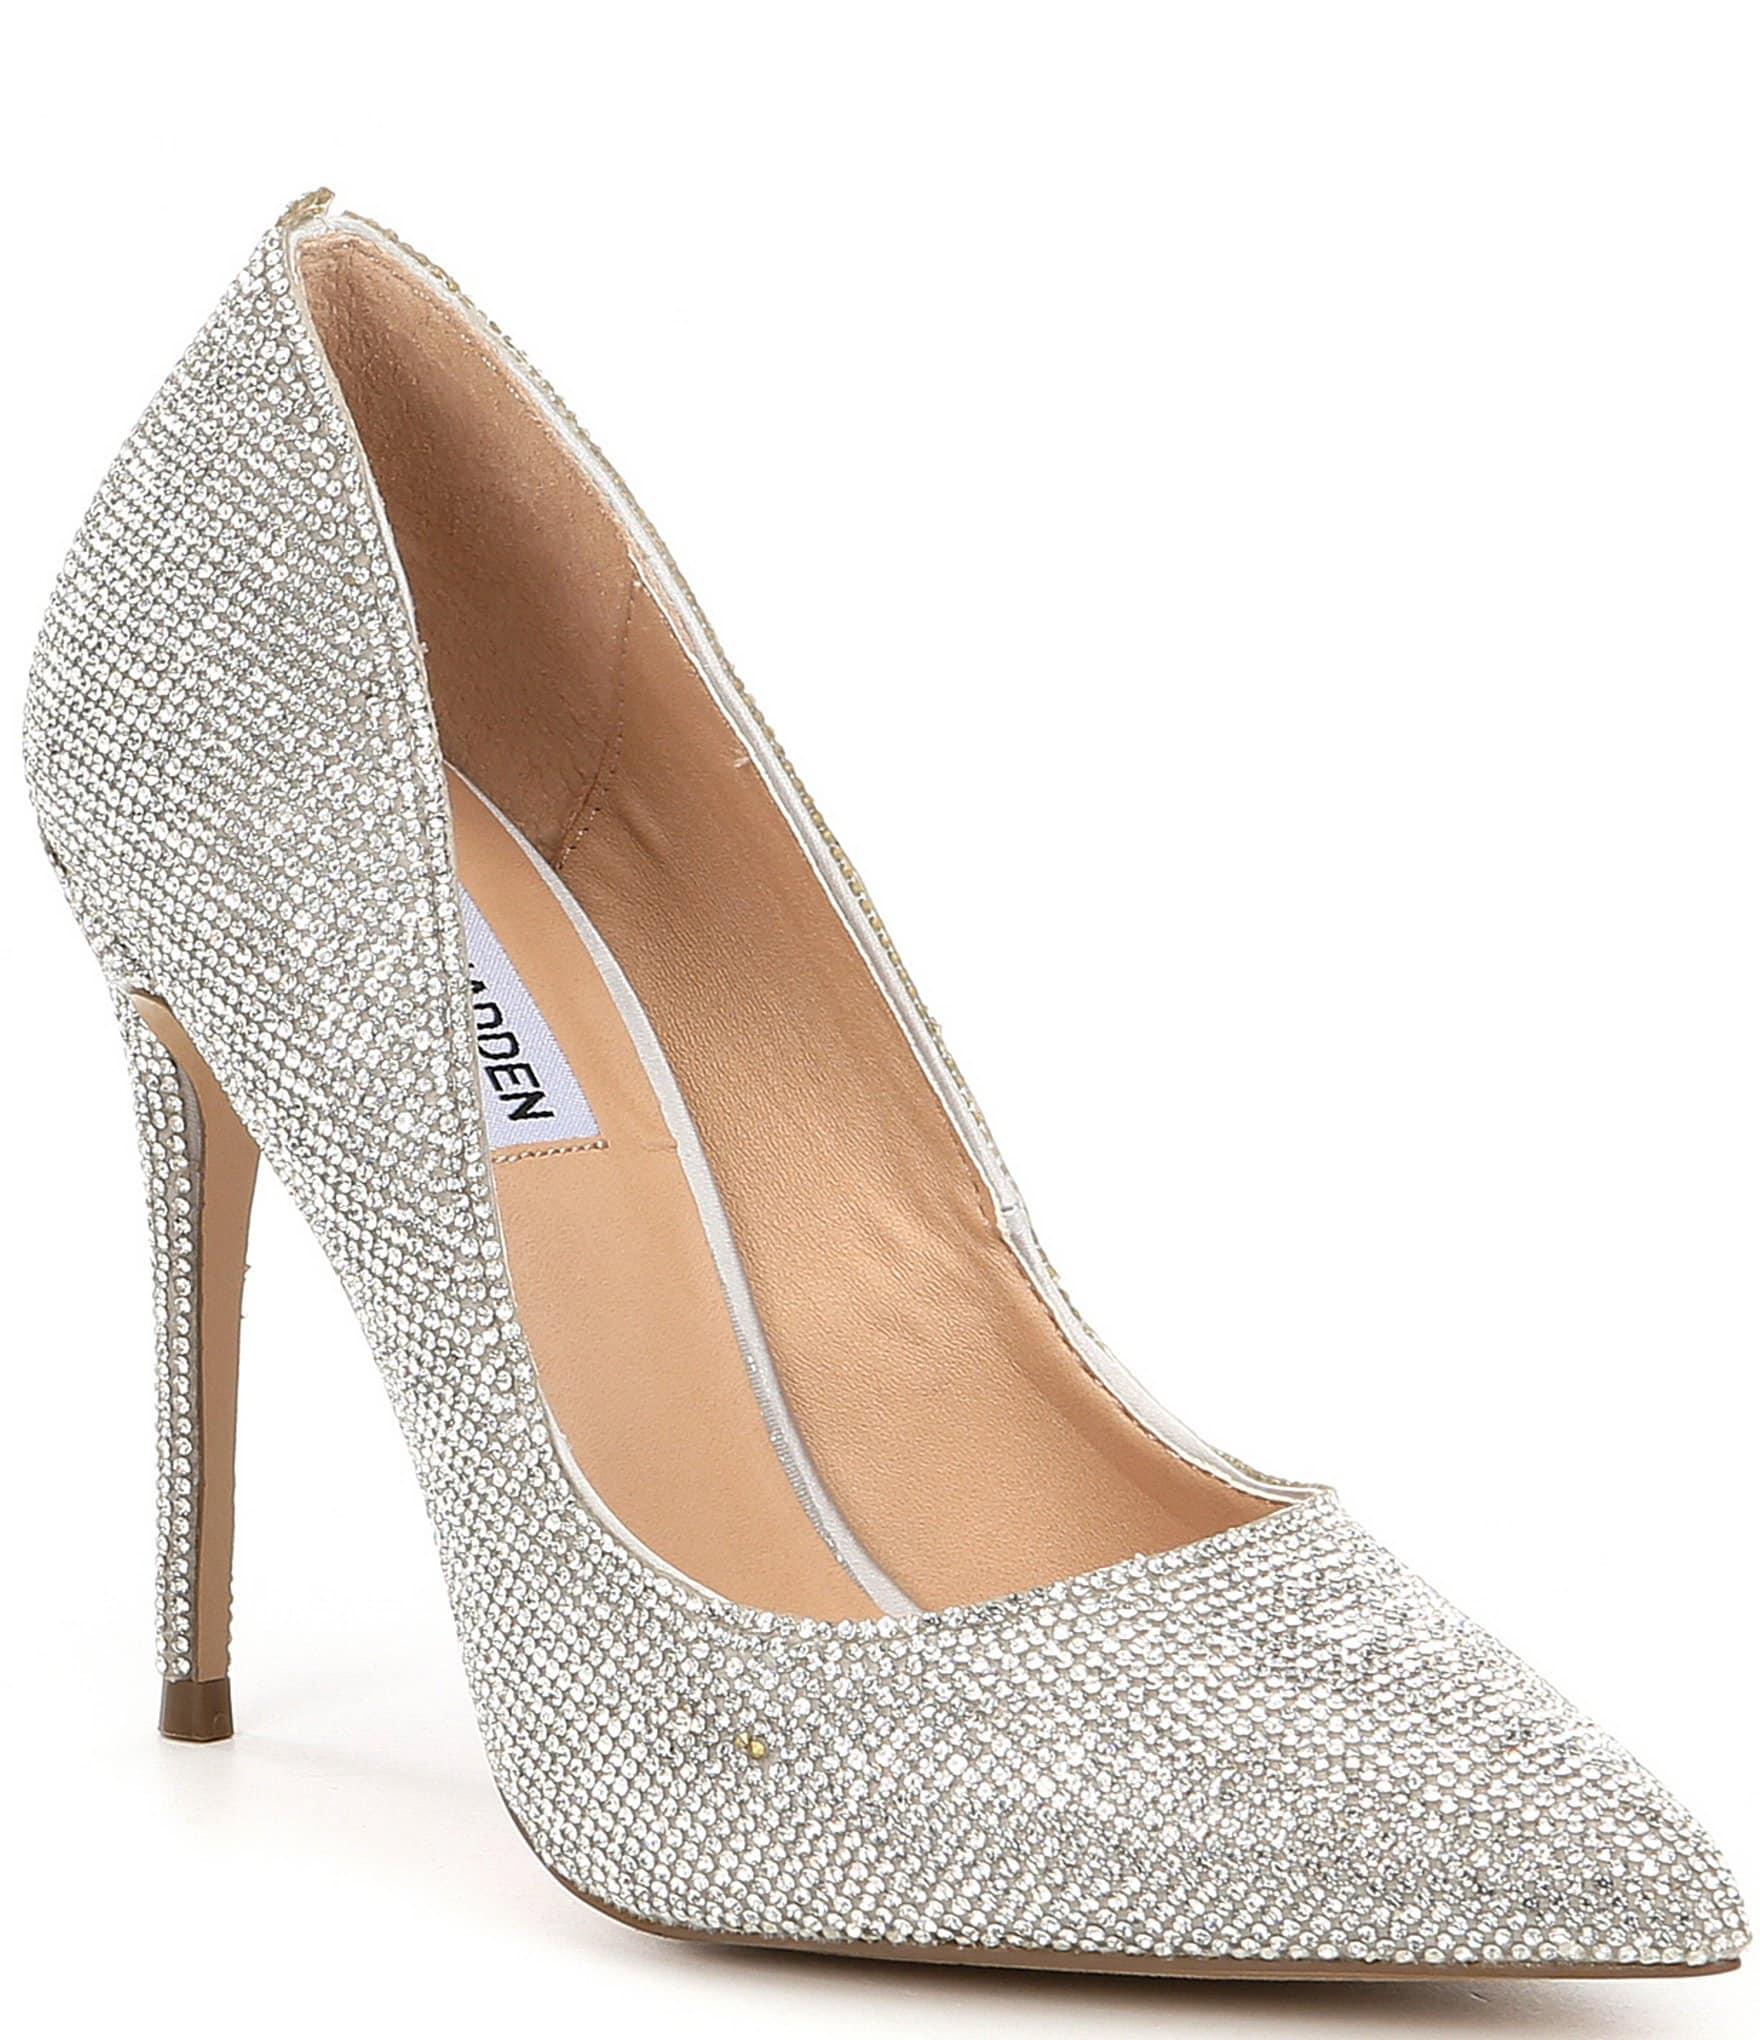 Silver Steve Madden Shoes for Women